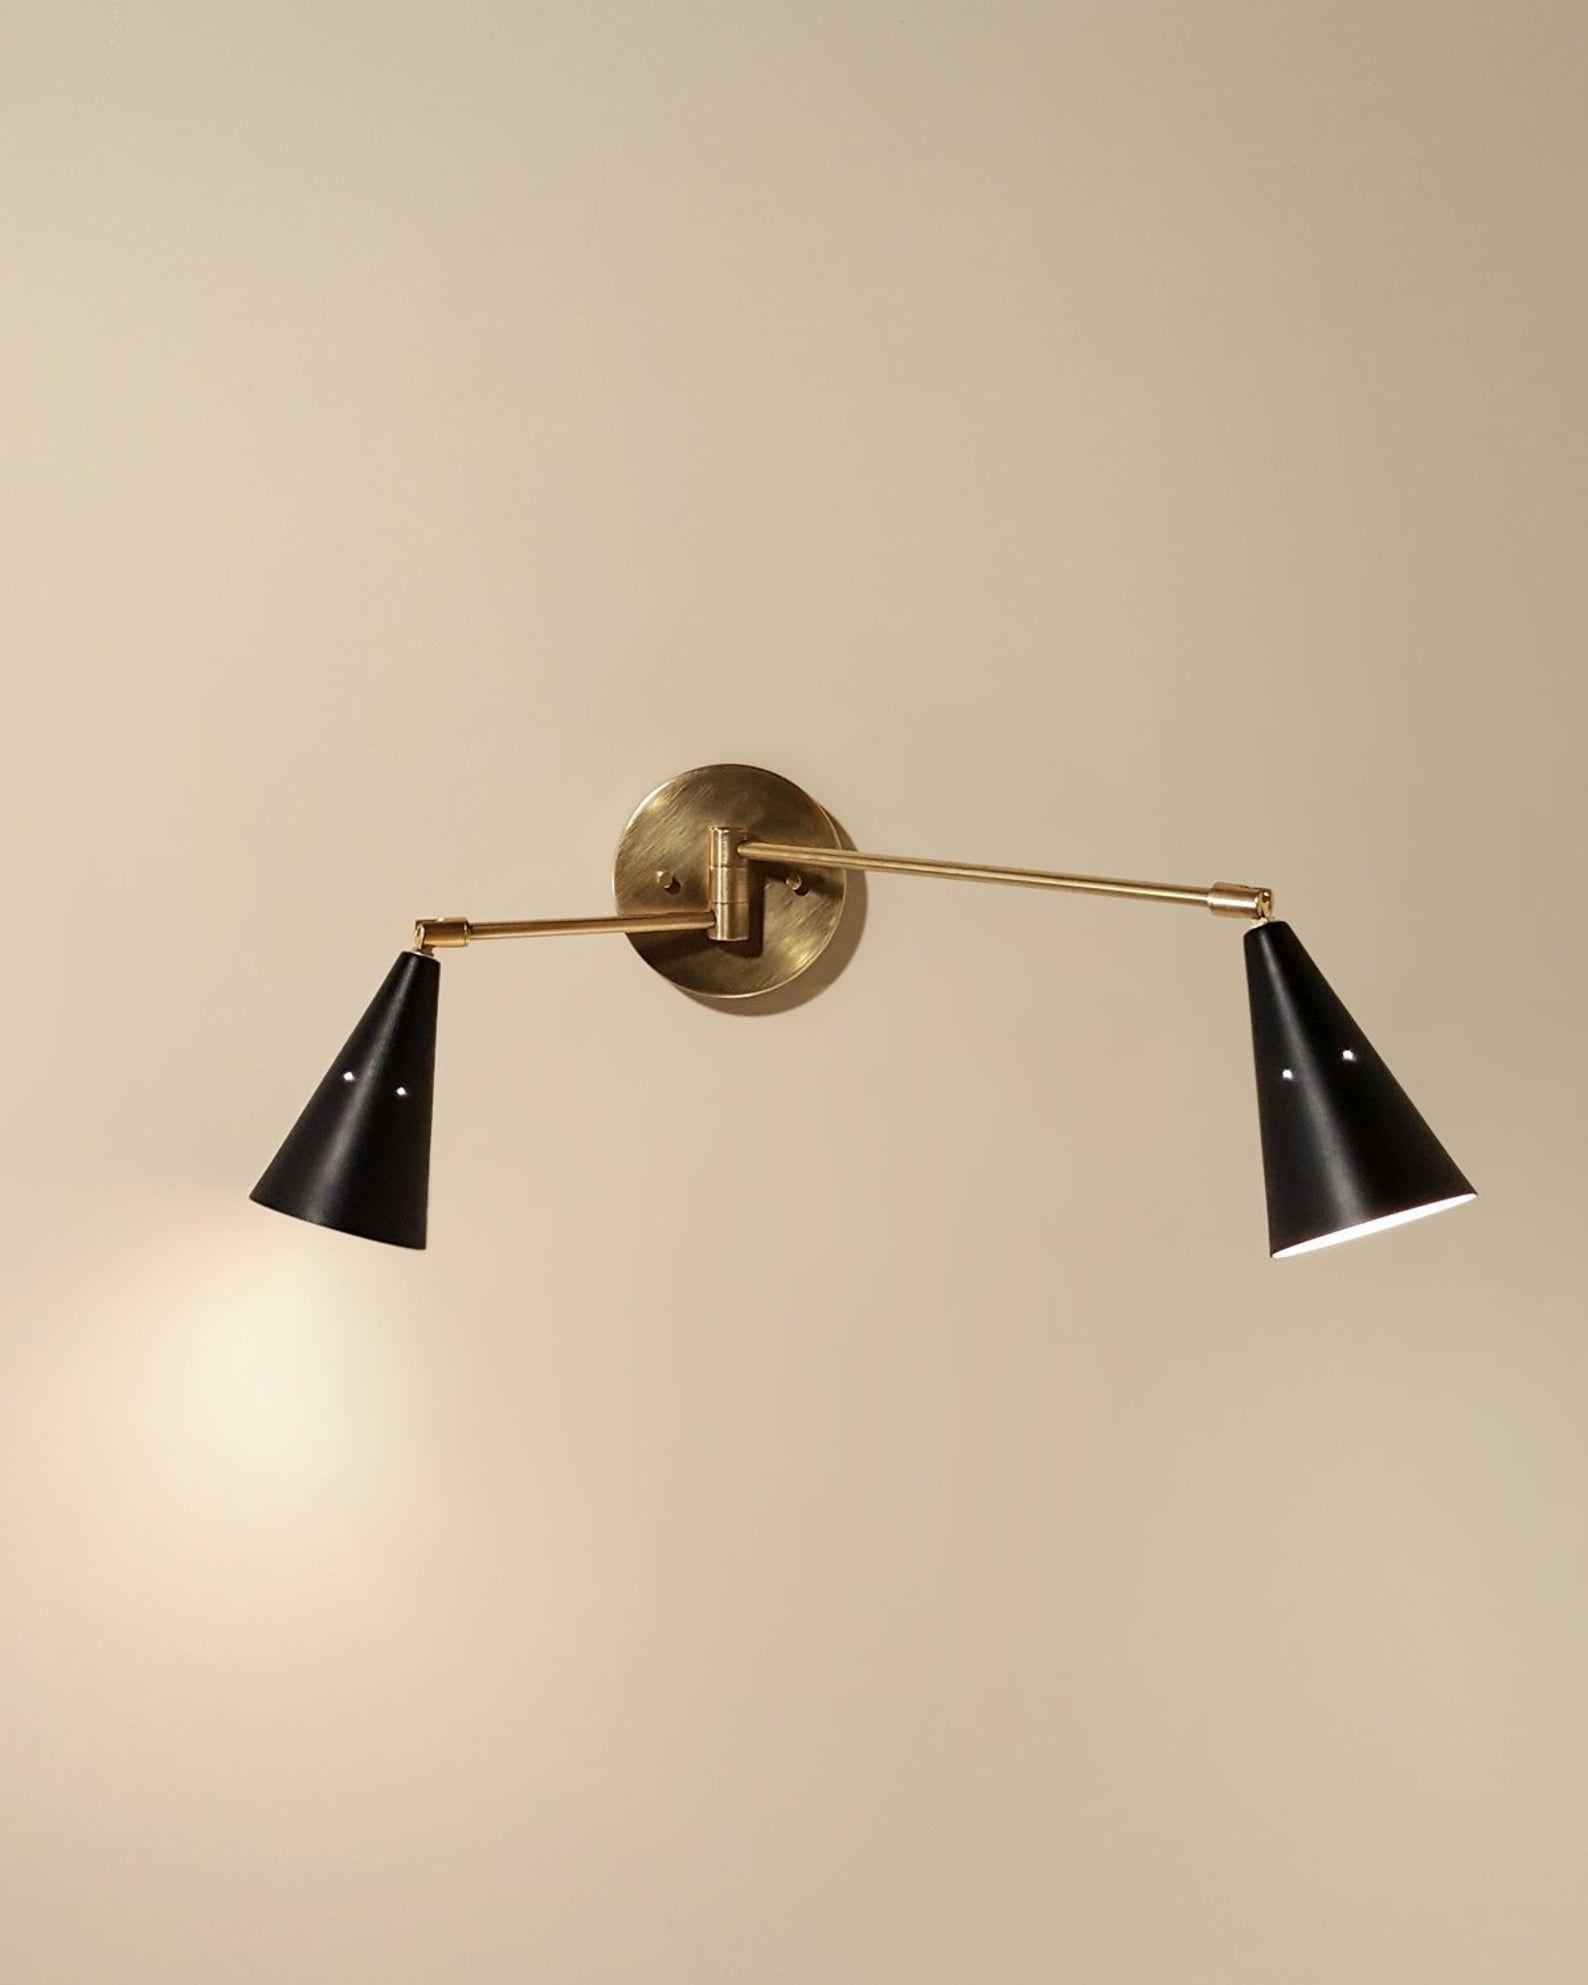 Pin By Rita Buechem On Christy Plug In Wall Lamp Brass Light Fixture Wall Lamps Bedroom